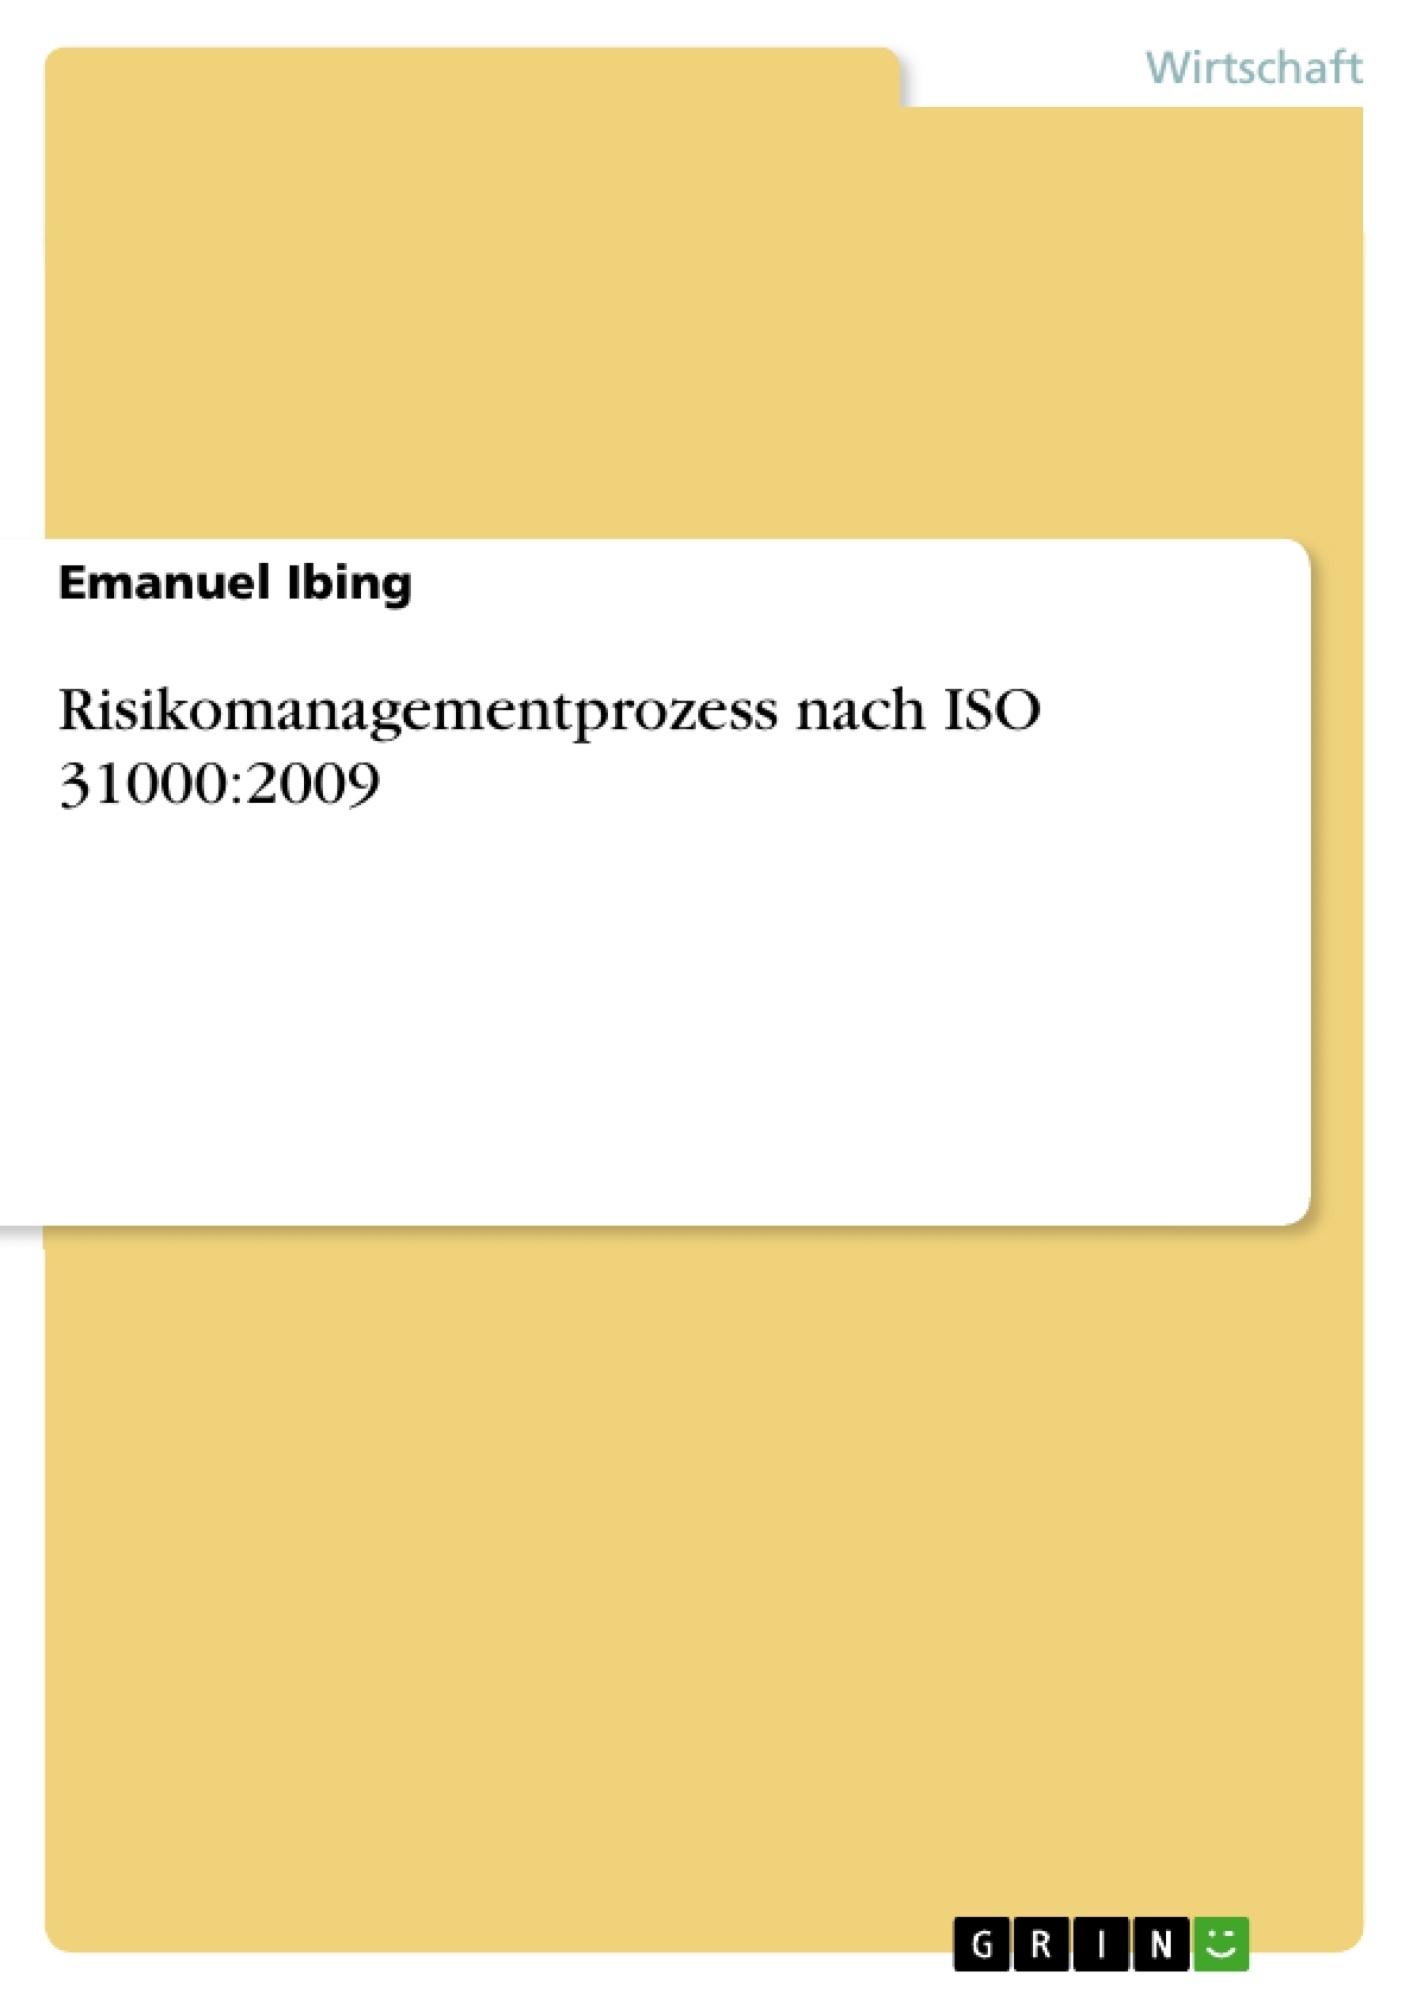 Titel: Risikomanagementprozess nach ISO 31000:2009